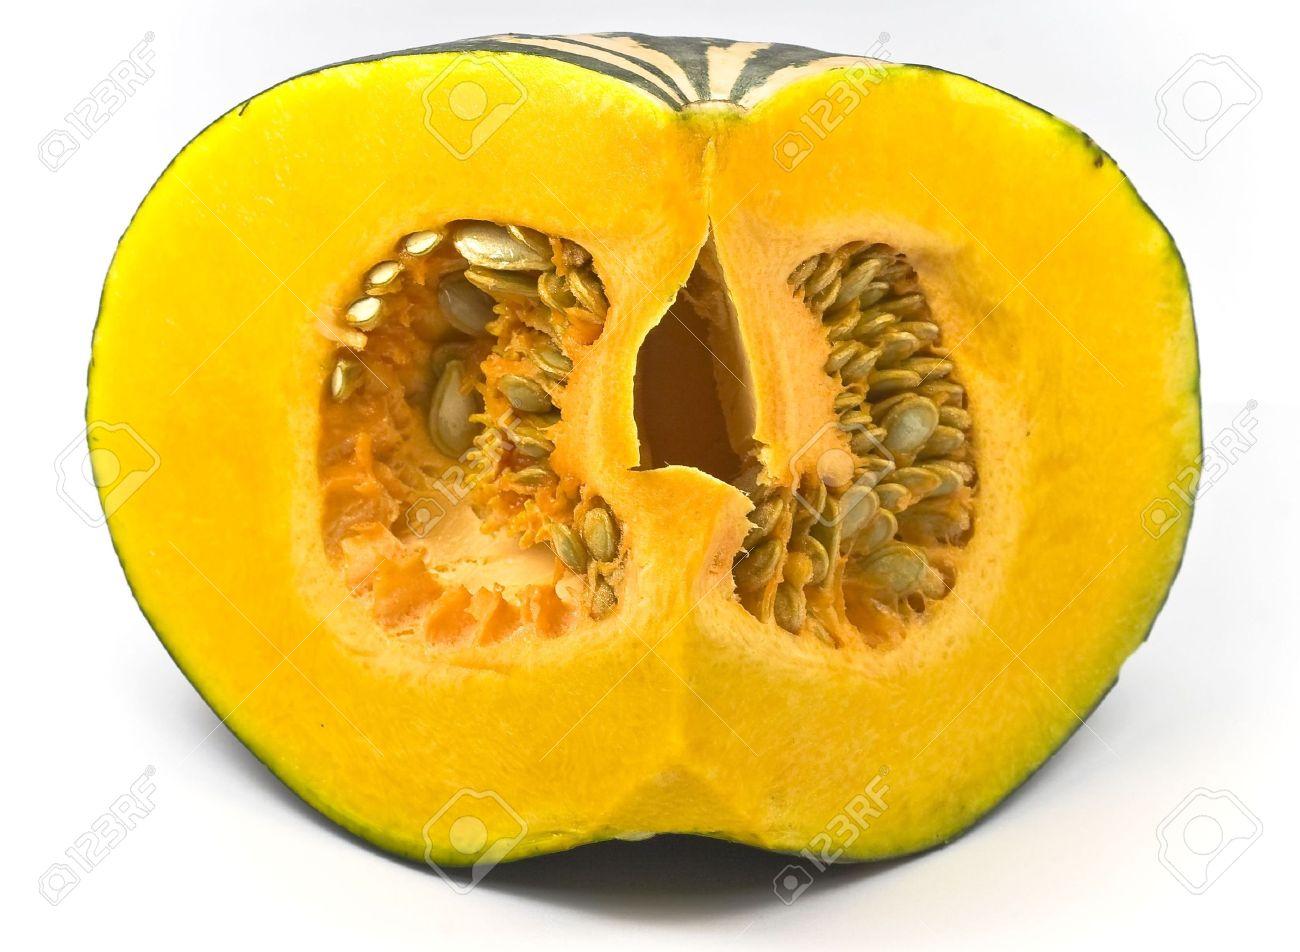 Pumpkin flesh and seeds Stock Photo - 6629705